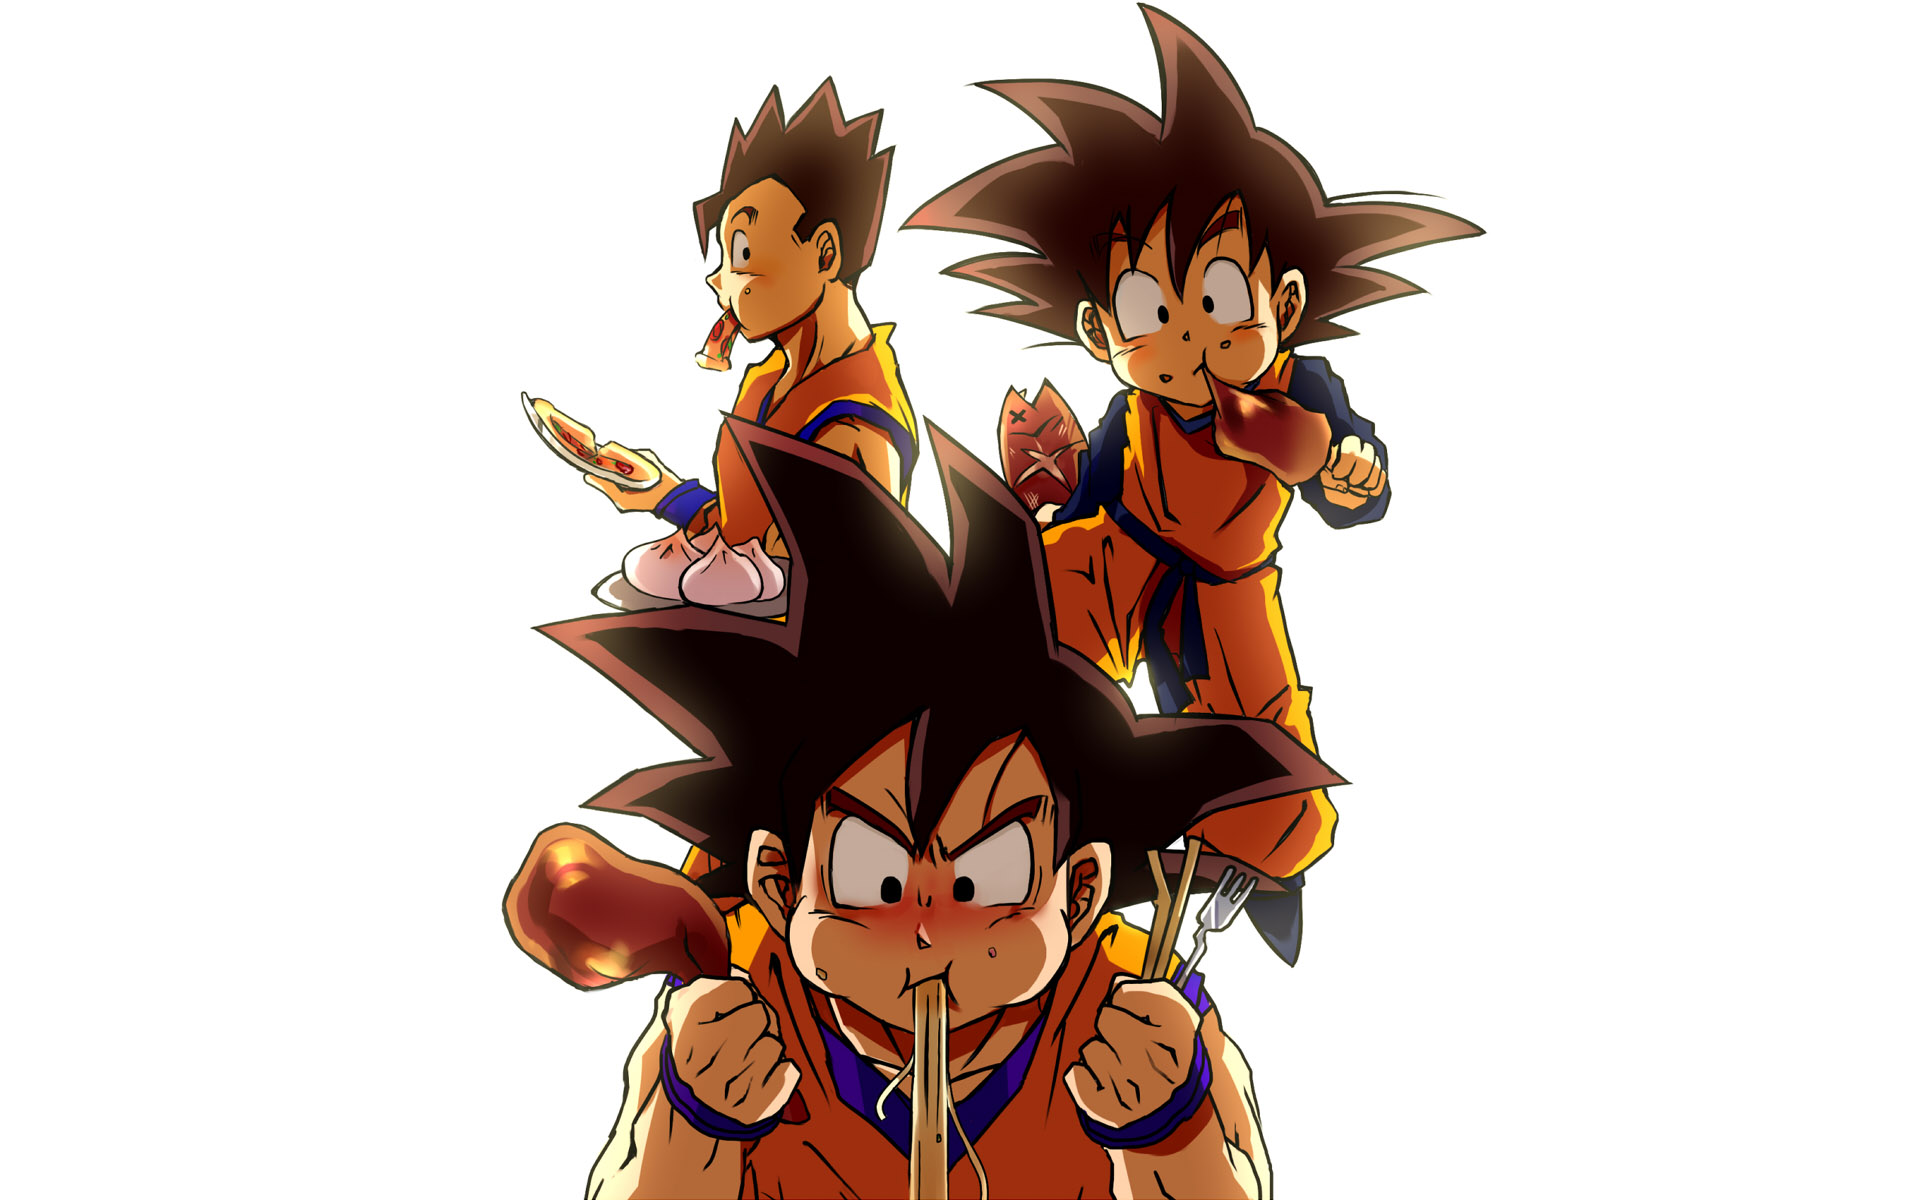 Dragon Ball Z Fond d'écran HD | Arrière-Plan | 1920x1200 | ID:310793 - Wallpaper Abyss